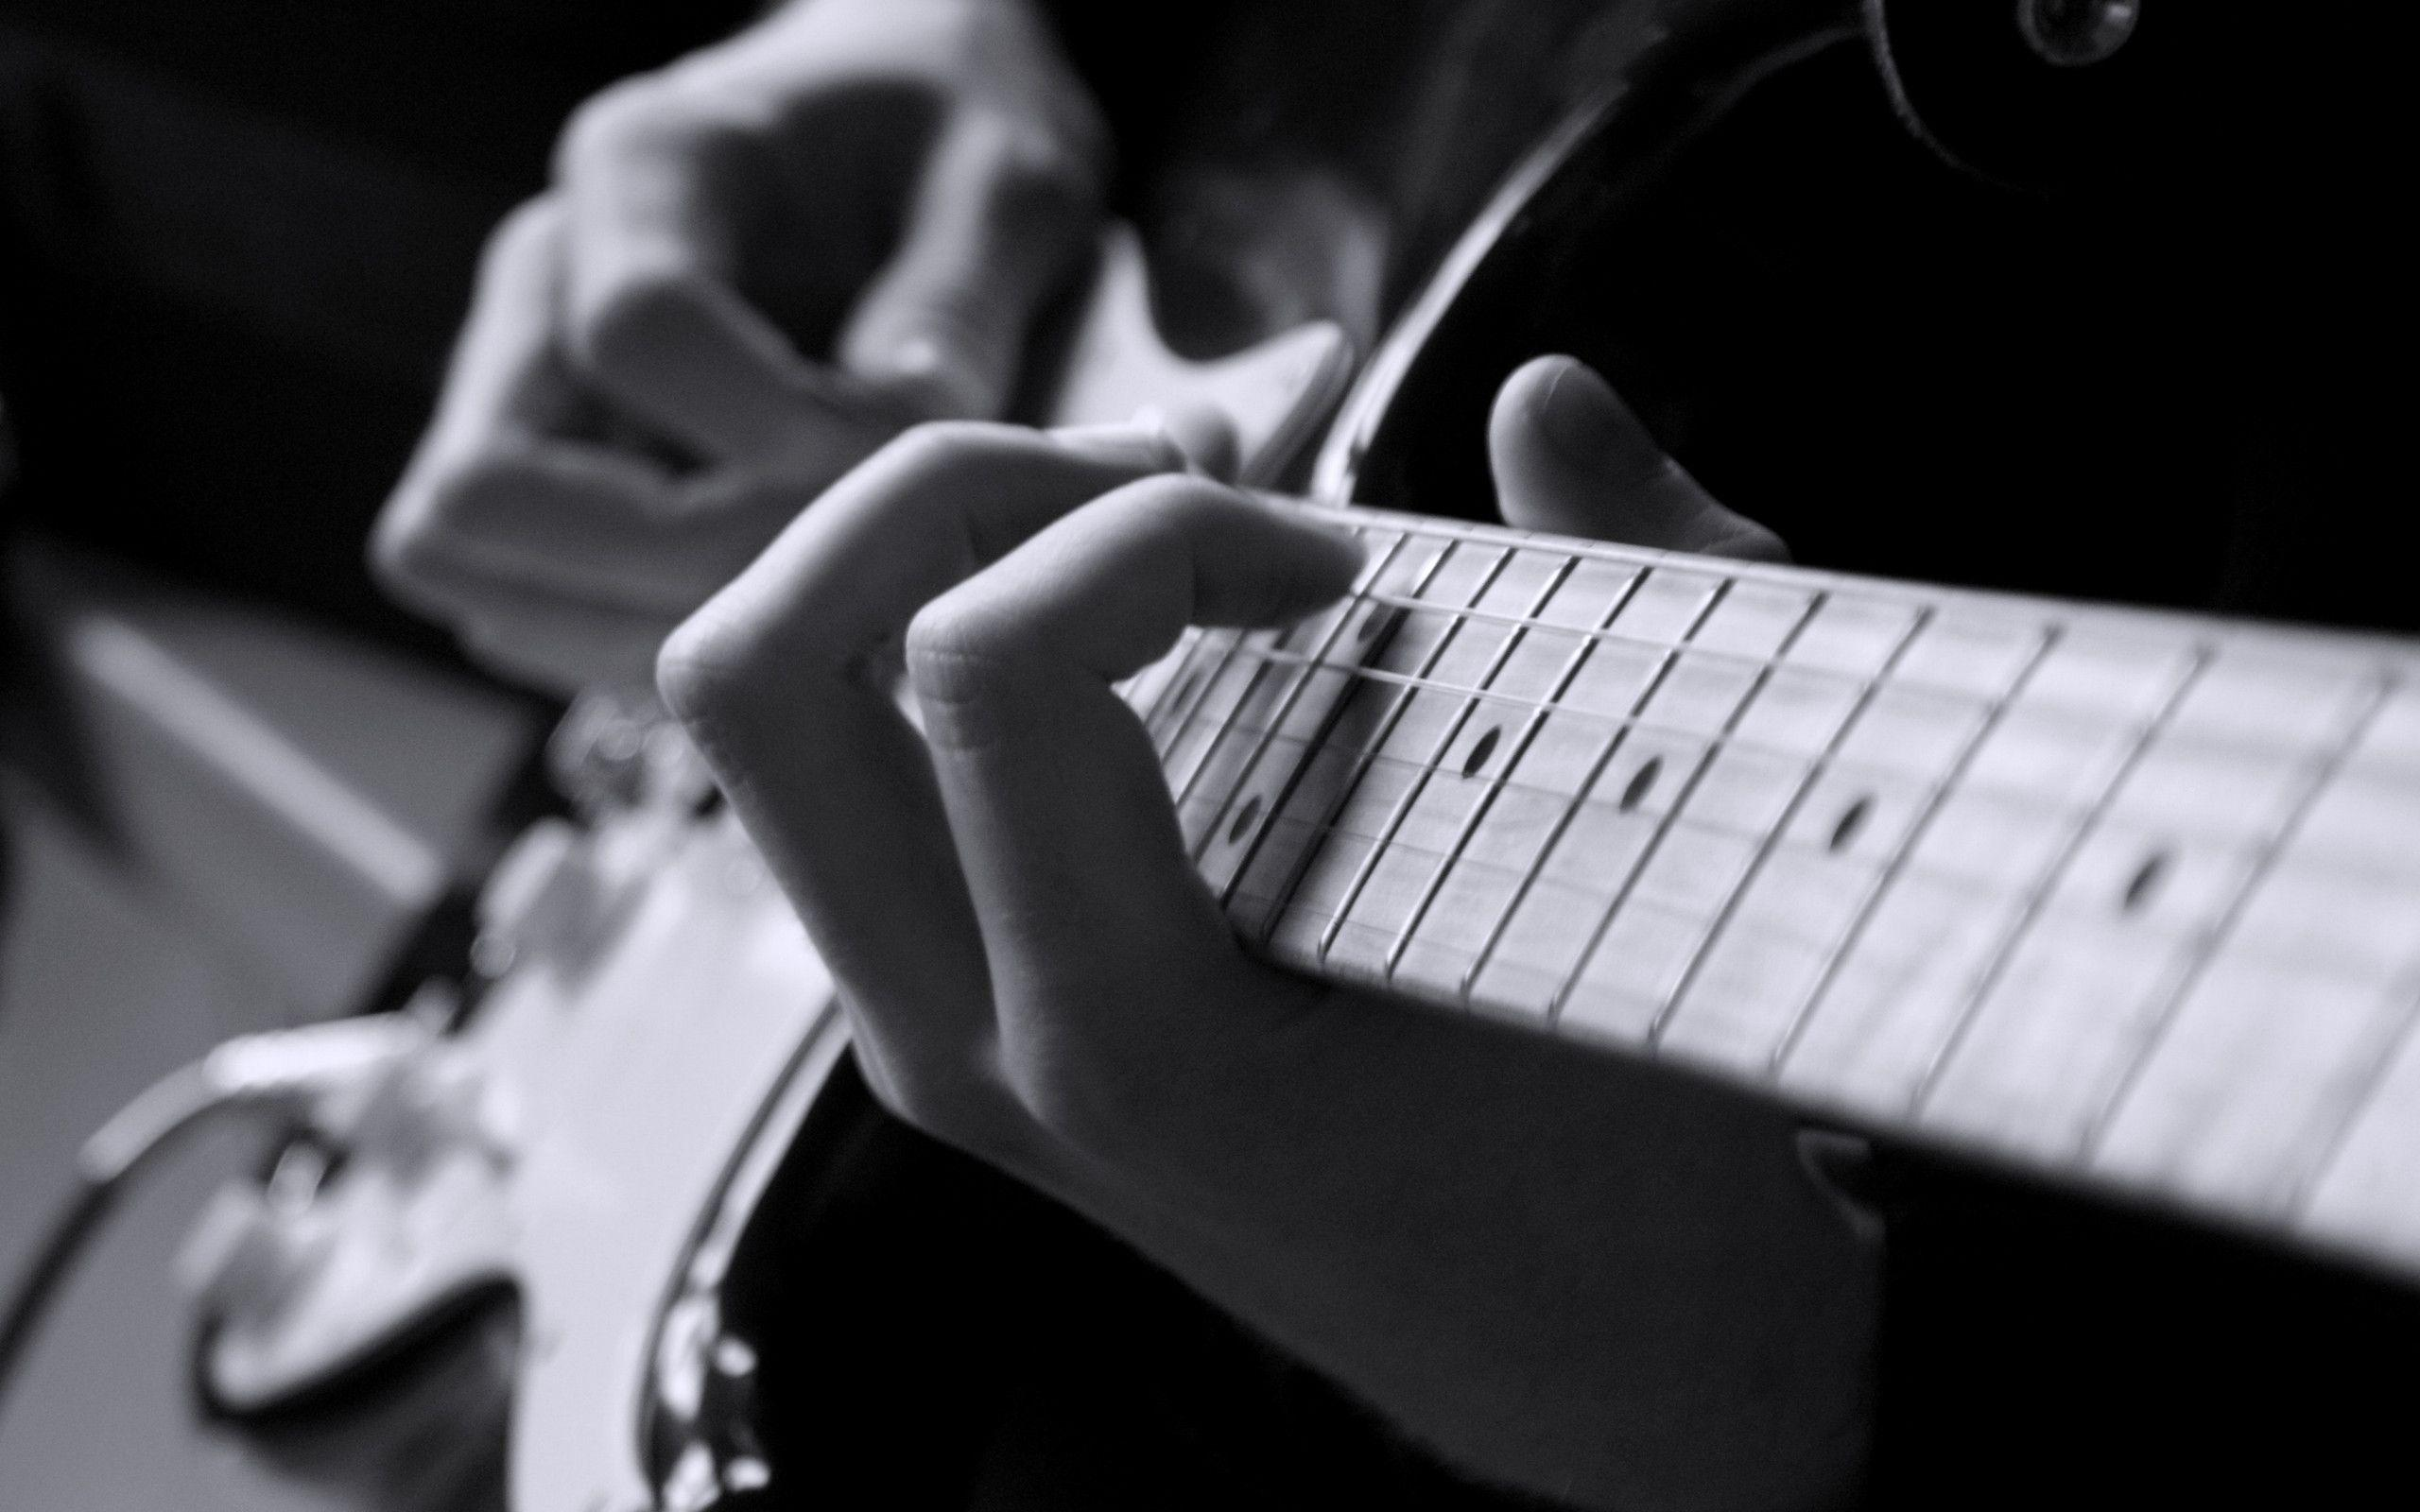 Hd wallpaper gitar - Guitar Wallpaper Desktop Hd Wallpapers Pictures Hd Wallpaper Photo